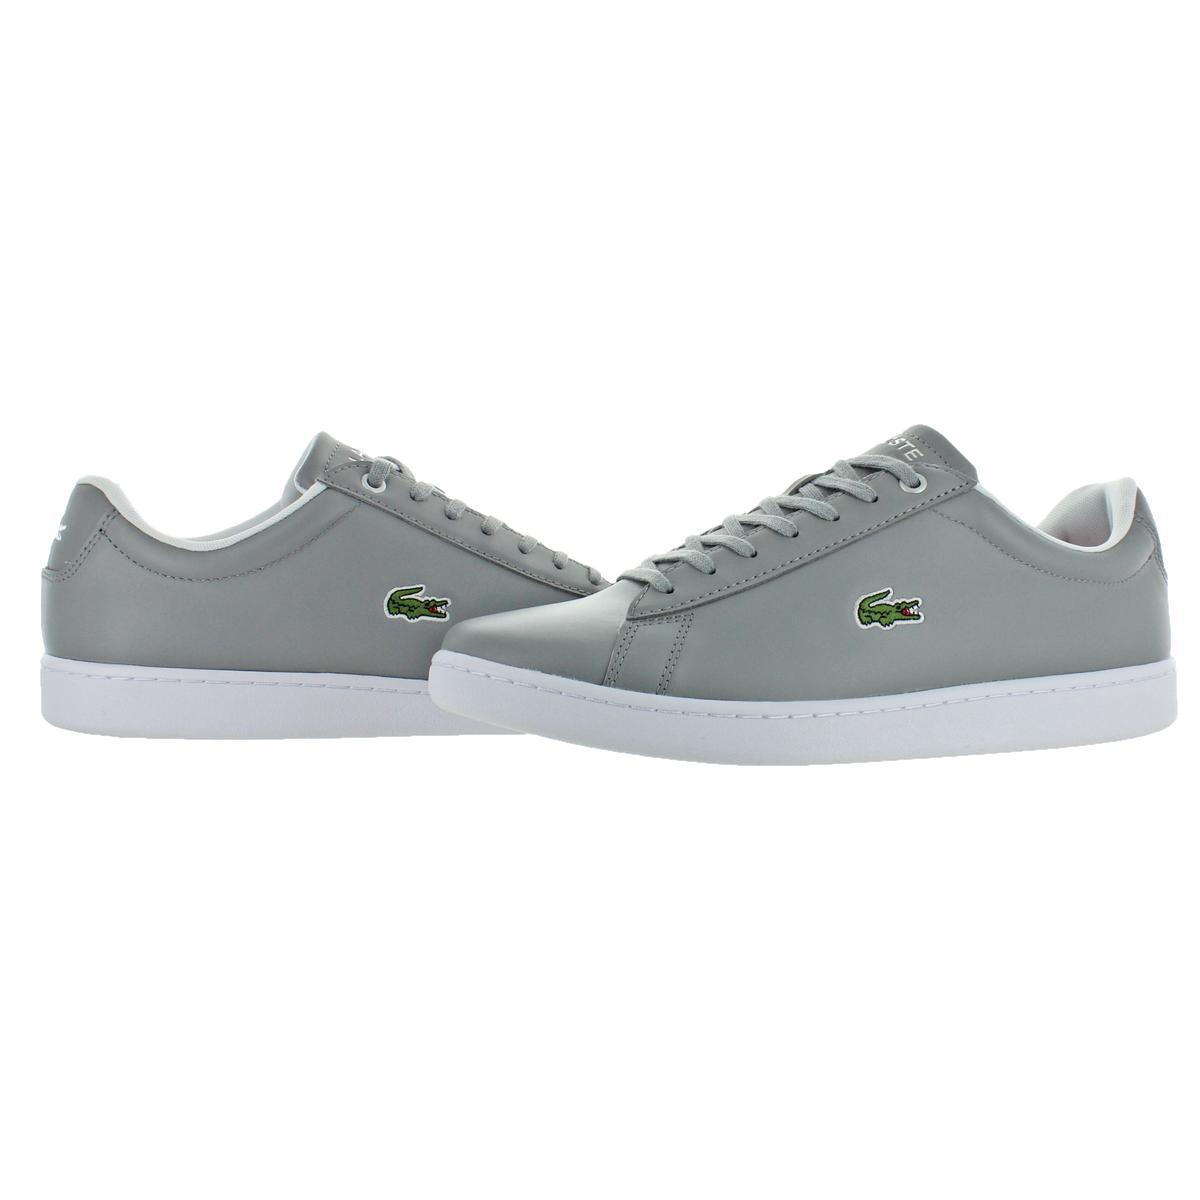 1ba5bcd74 Lacoste Men s Hydez Leather Court Fashion Sneaker Shoes